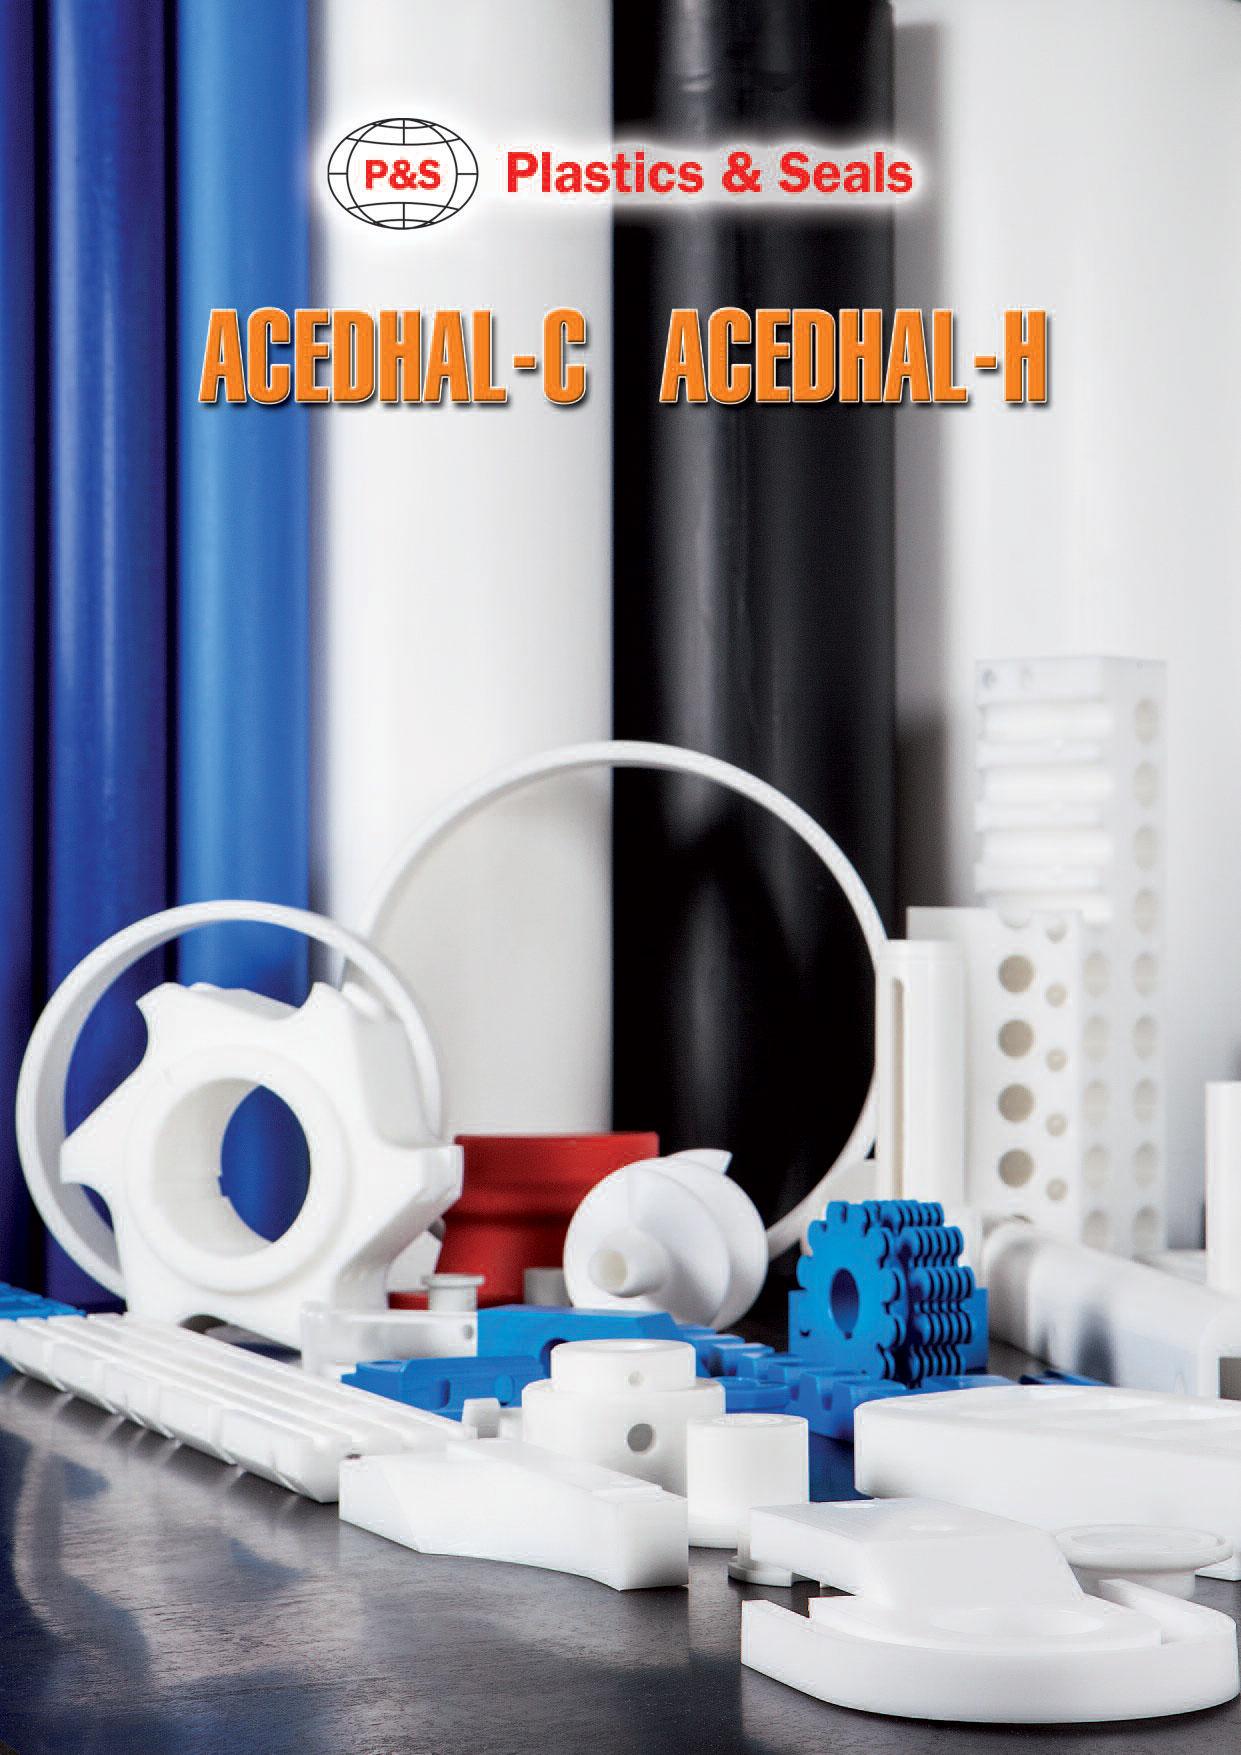 ACEDHAL-C ACEDHAL-H